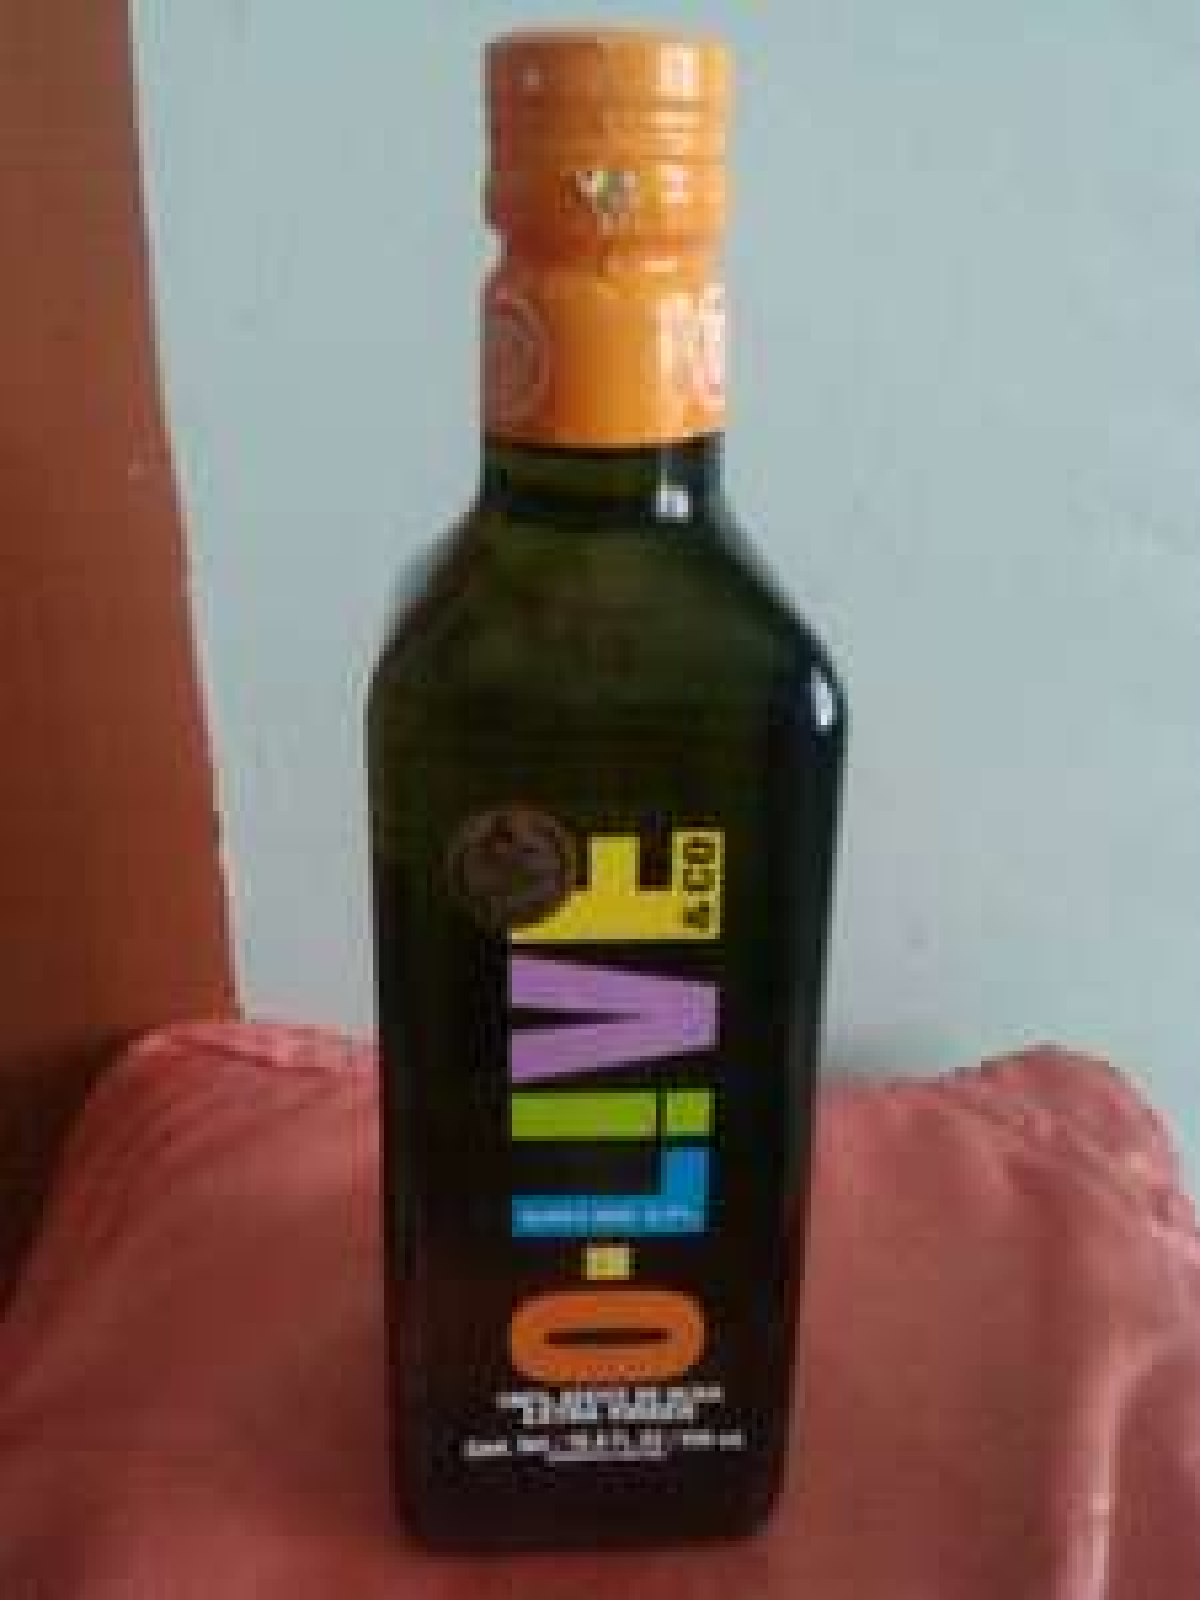 Walmart Galerias Saltillo: Aceite de Oliva O-LIVE 500 ml a $24.01, Jarabe Infantil St. Joseph 240 ml a $20.03, Mr. Musculo 1 Lt a $10.01, Pinol Vidrios 450 ml a $3.01, Tornilleria a $1.01